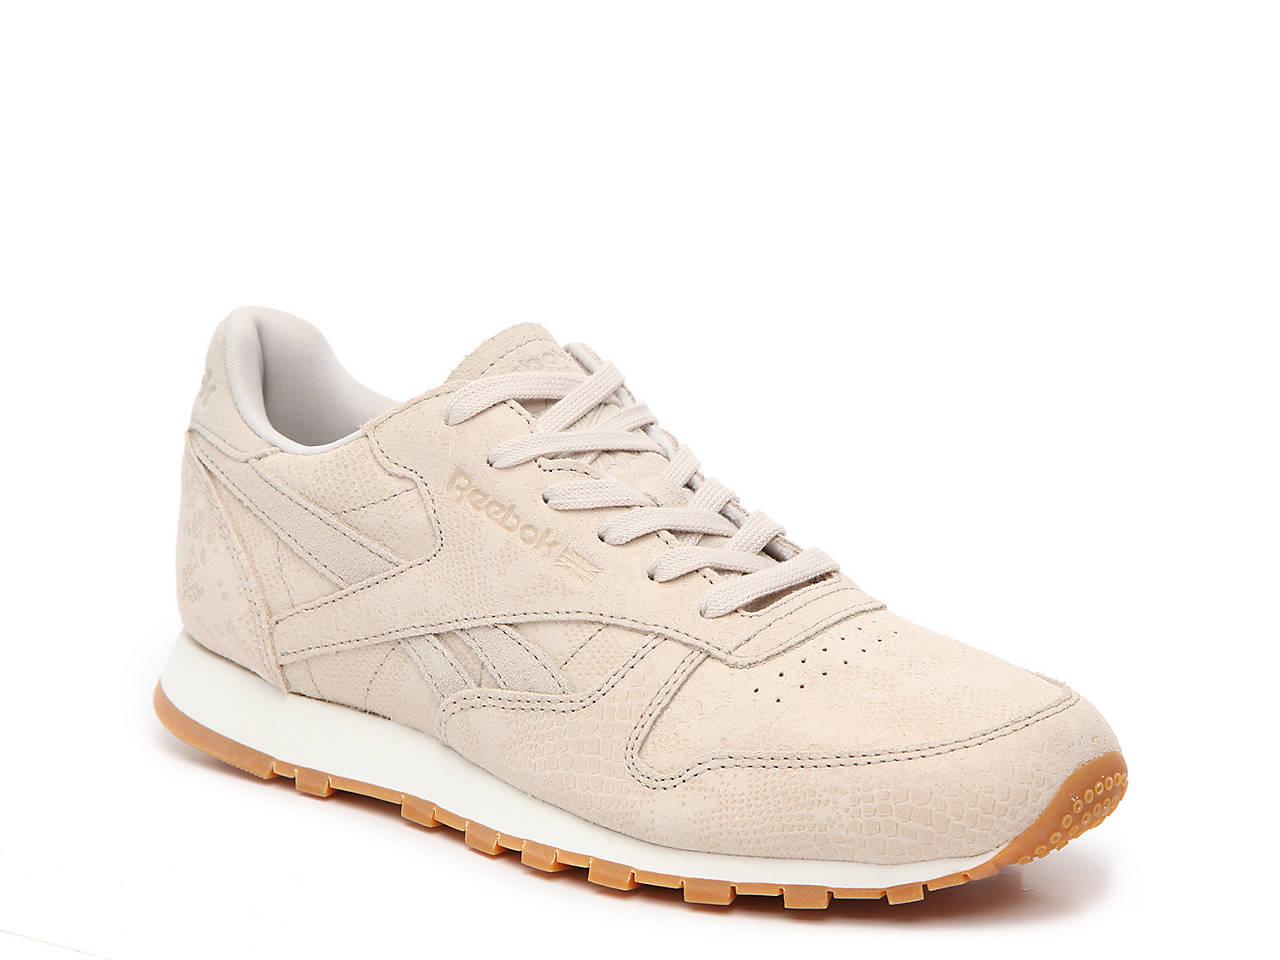 15551e28a5b Reebok Classic Leather Clean Exotics Sneaker - Women s Women s Shoes ...